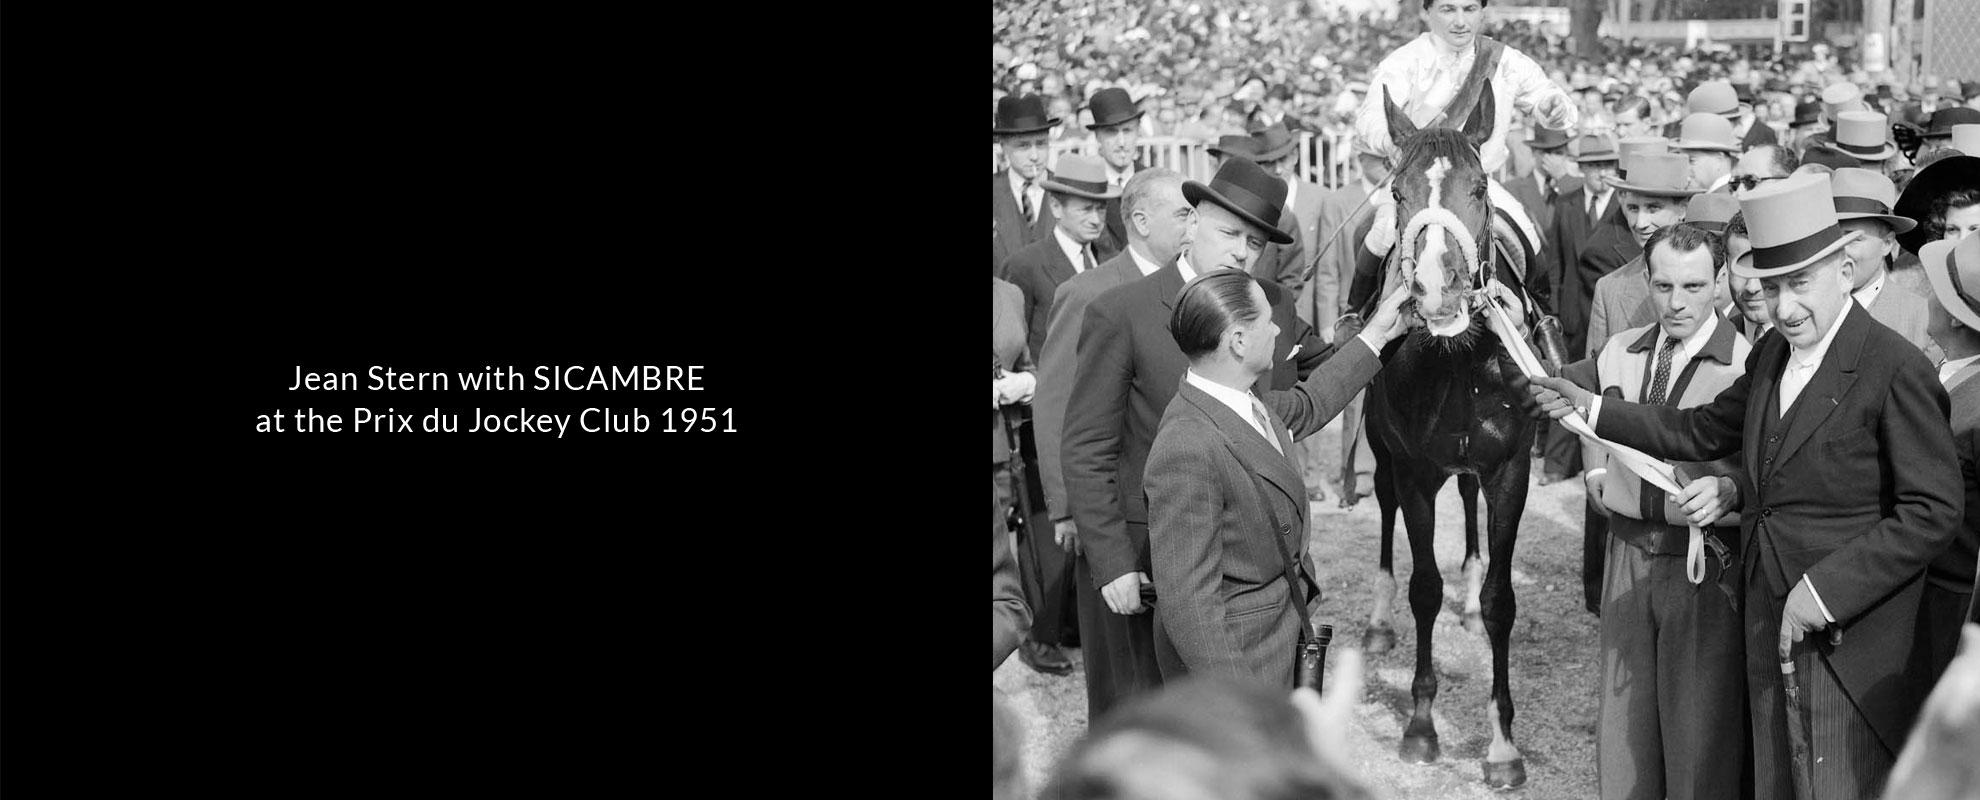 _jean-stern-with-sicambre-at-the-prix-du-jockey-club-1951-v2